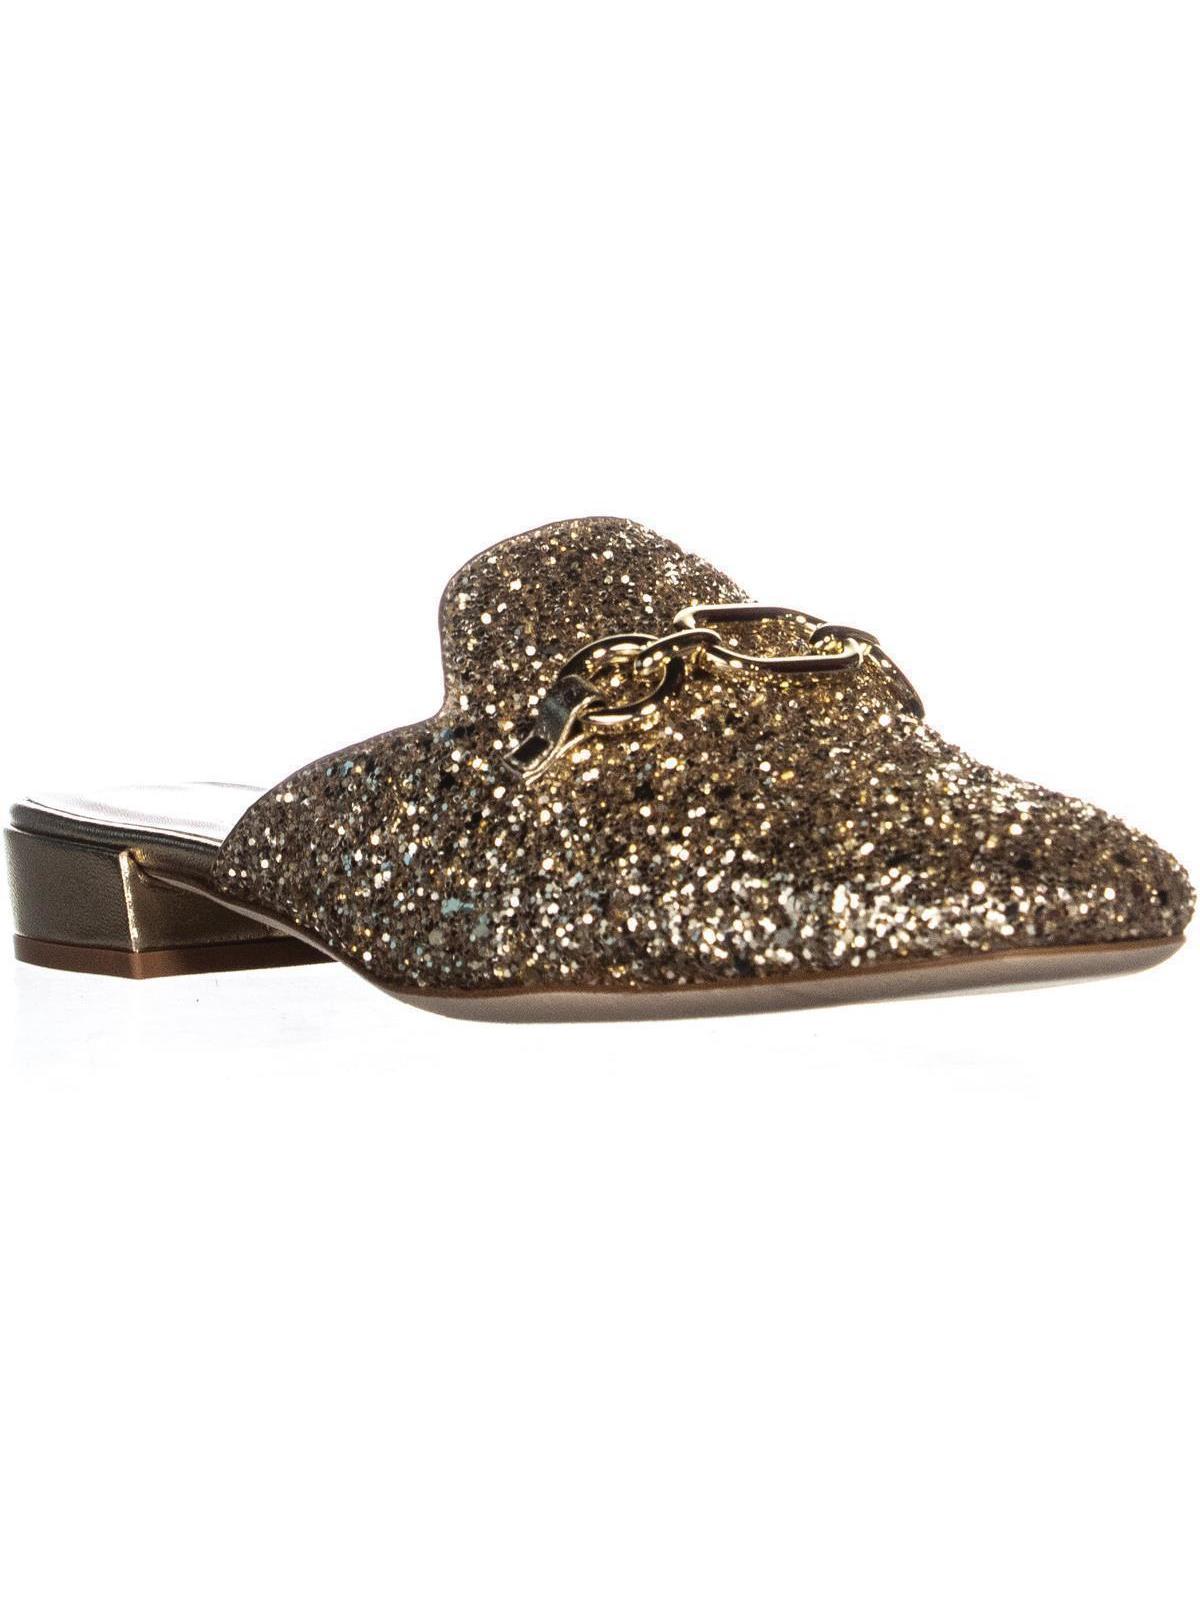 cd14ce2f4630 Kate Spade New York Glendi Low Heel Slip-On Mules